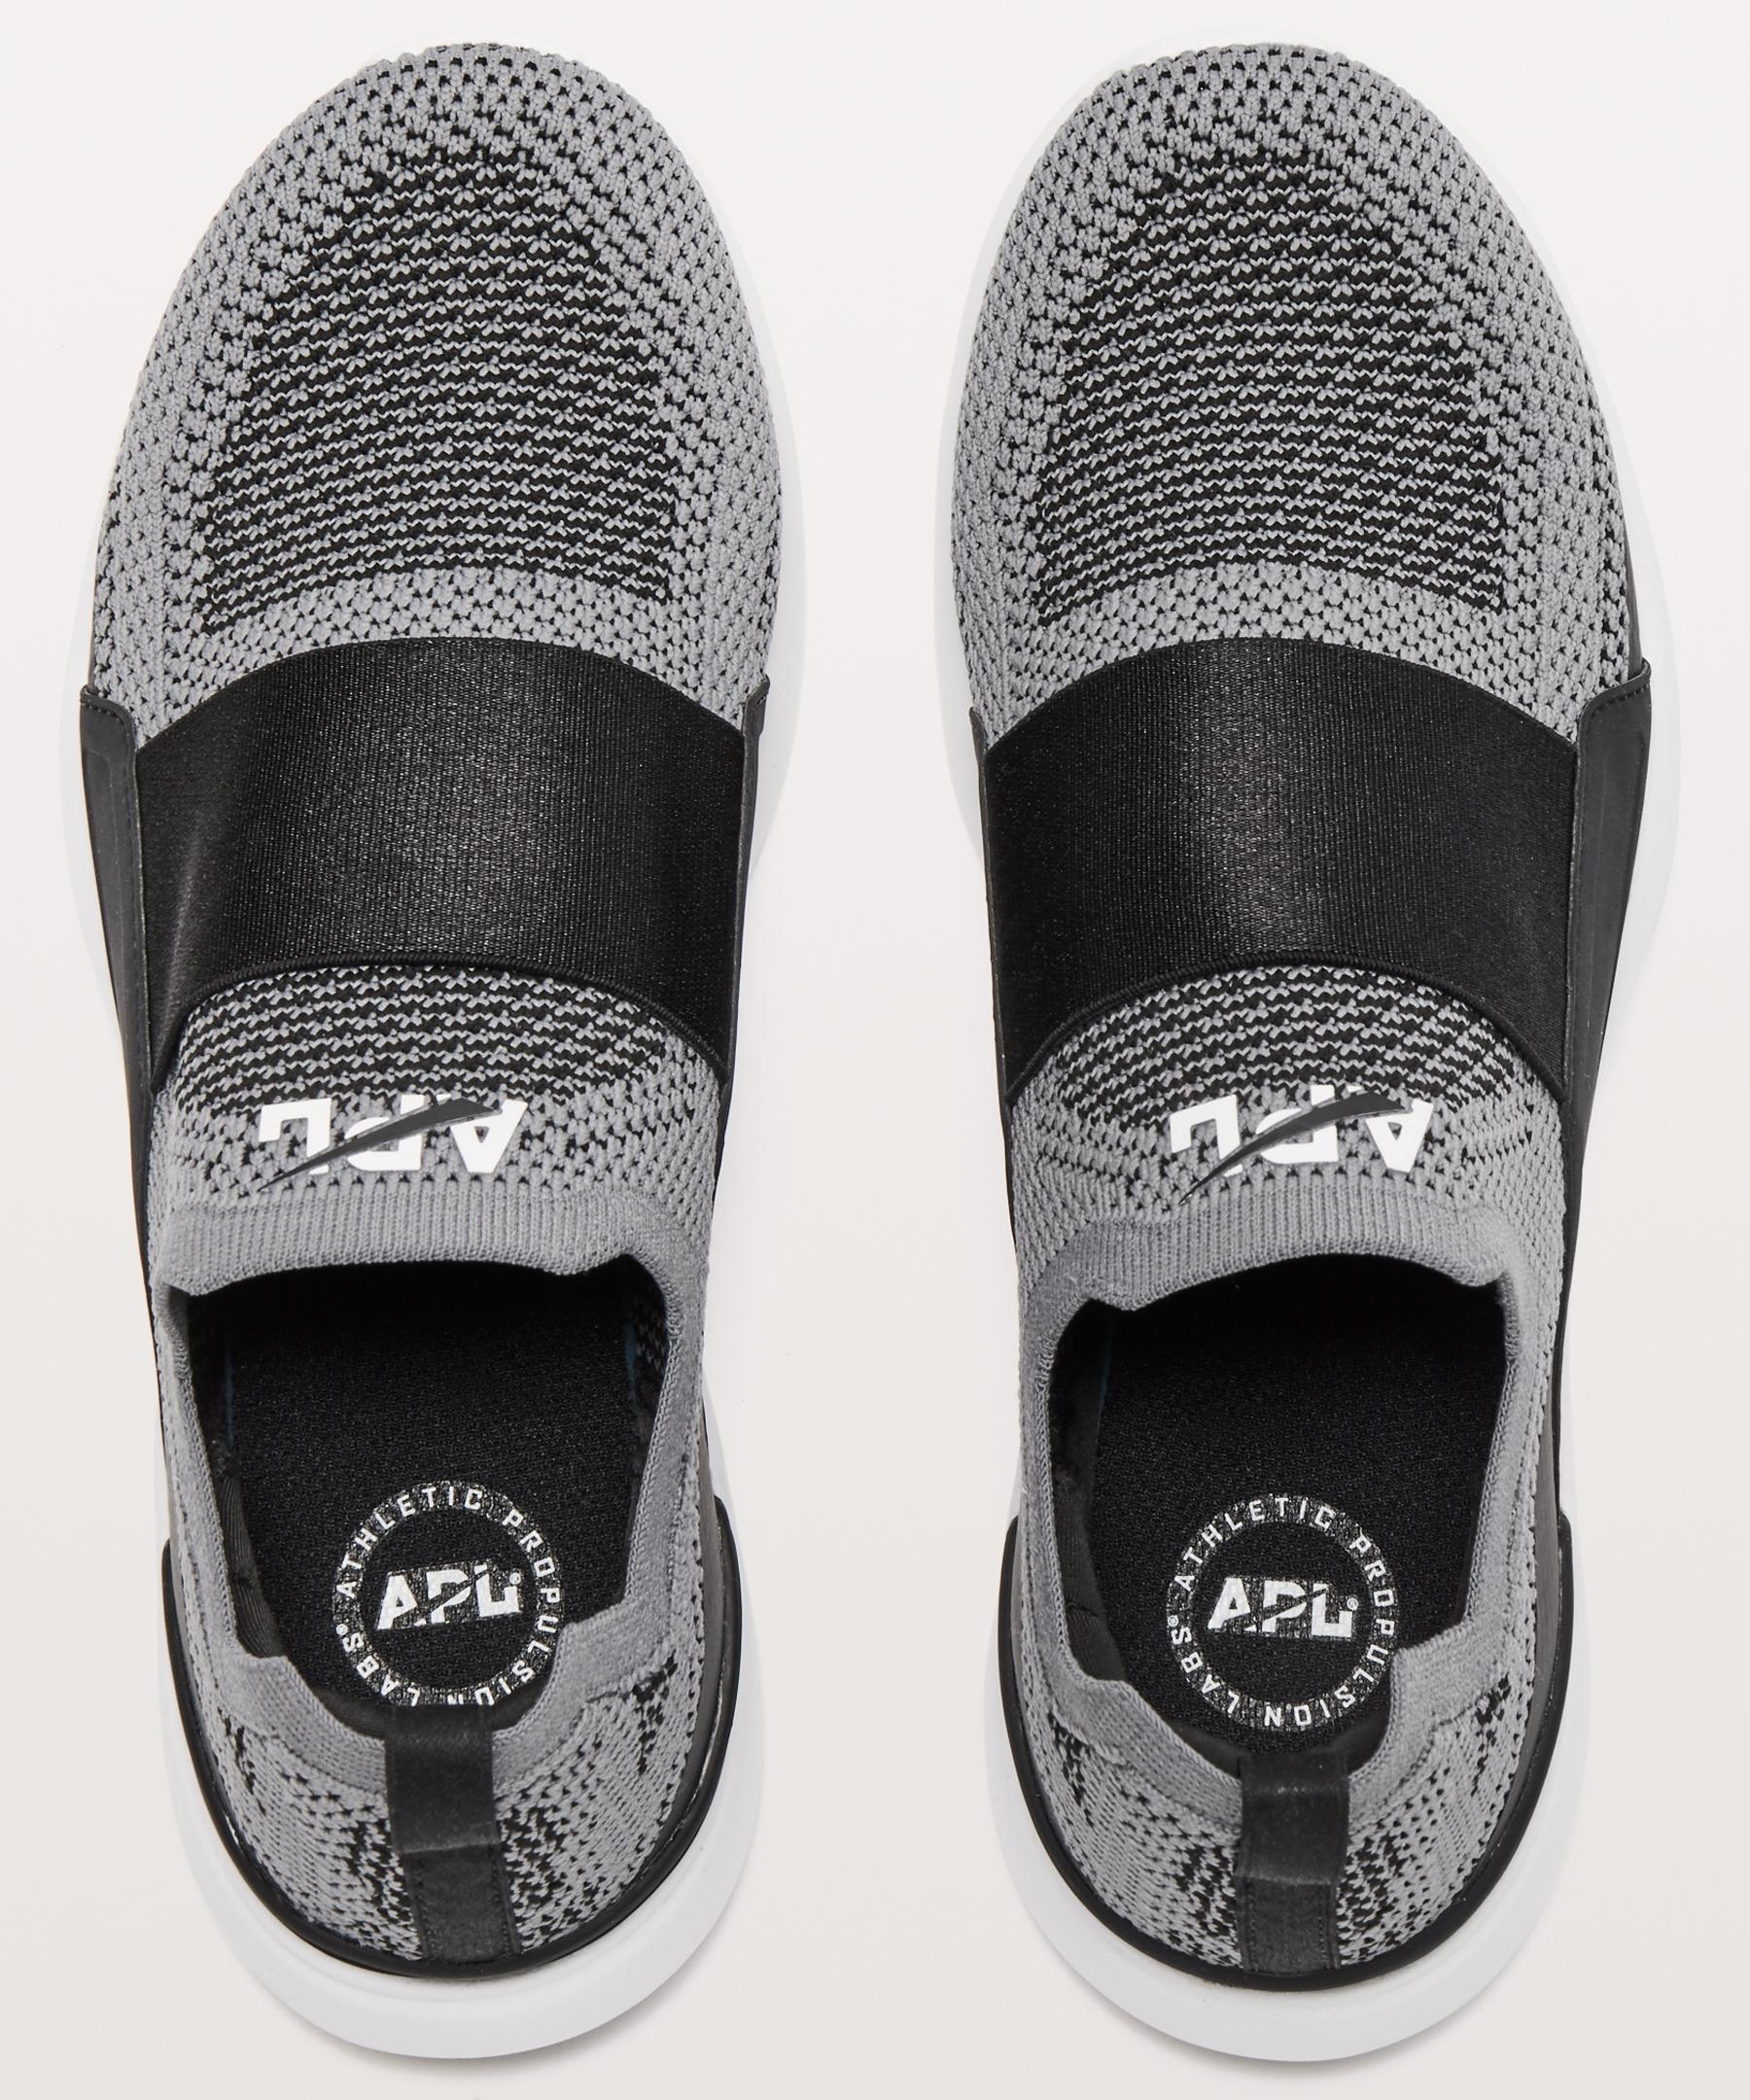 lululemon | Yoga shoes men